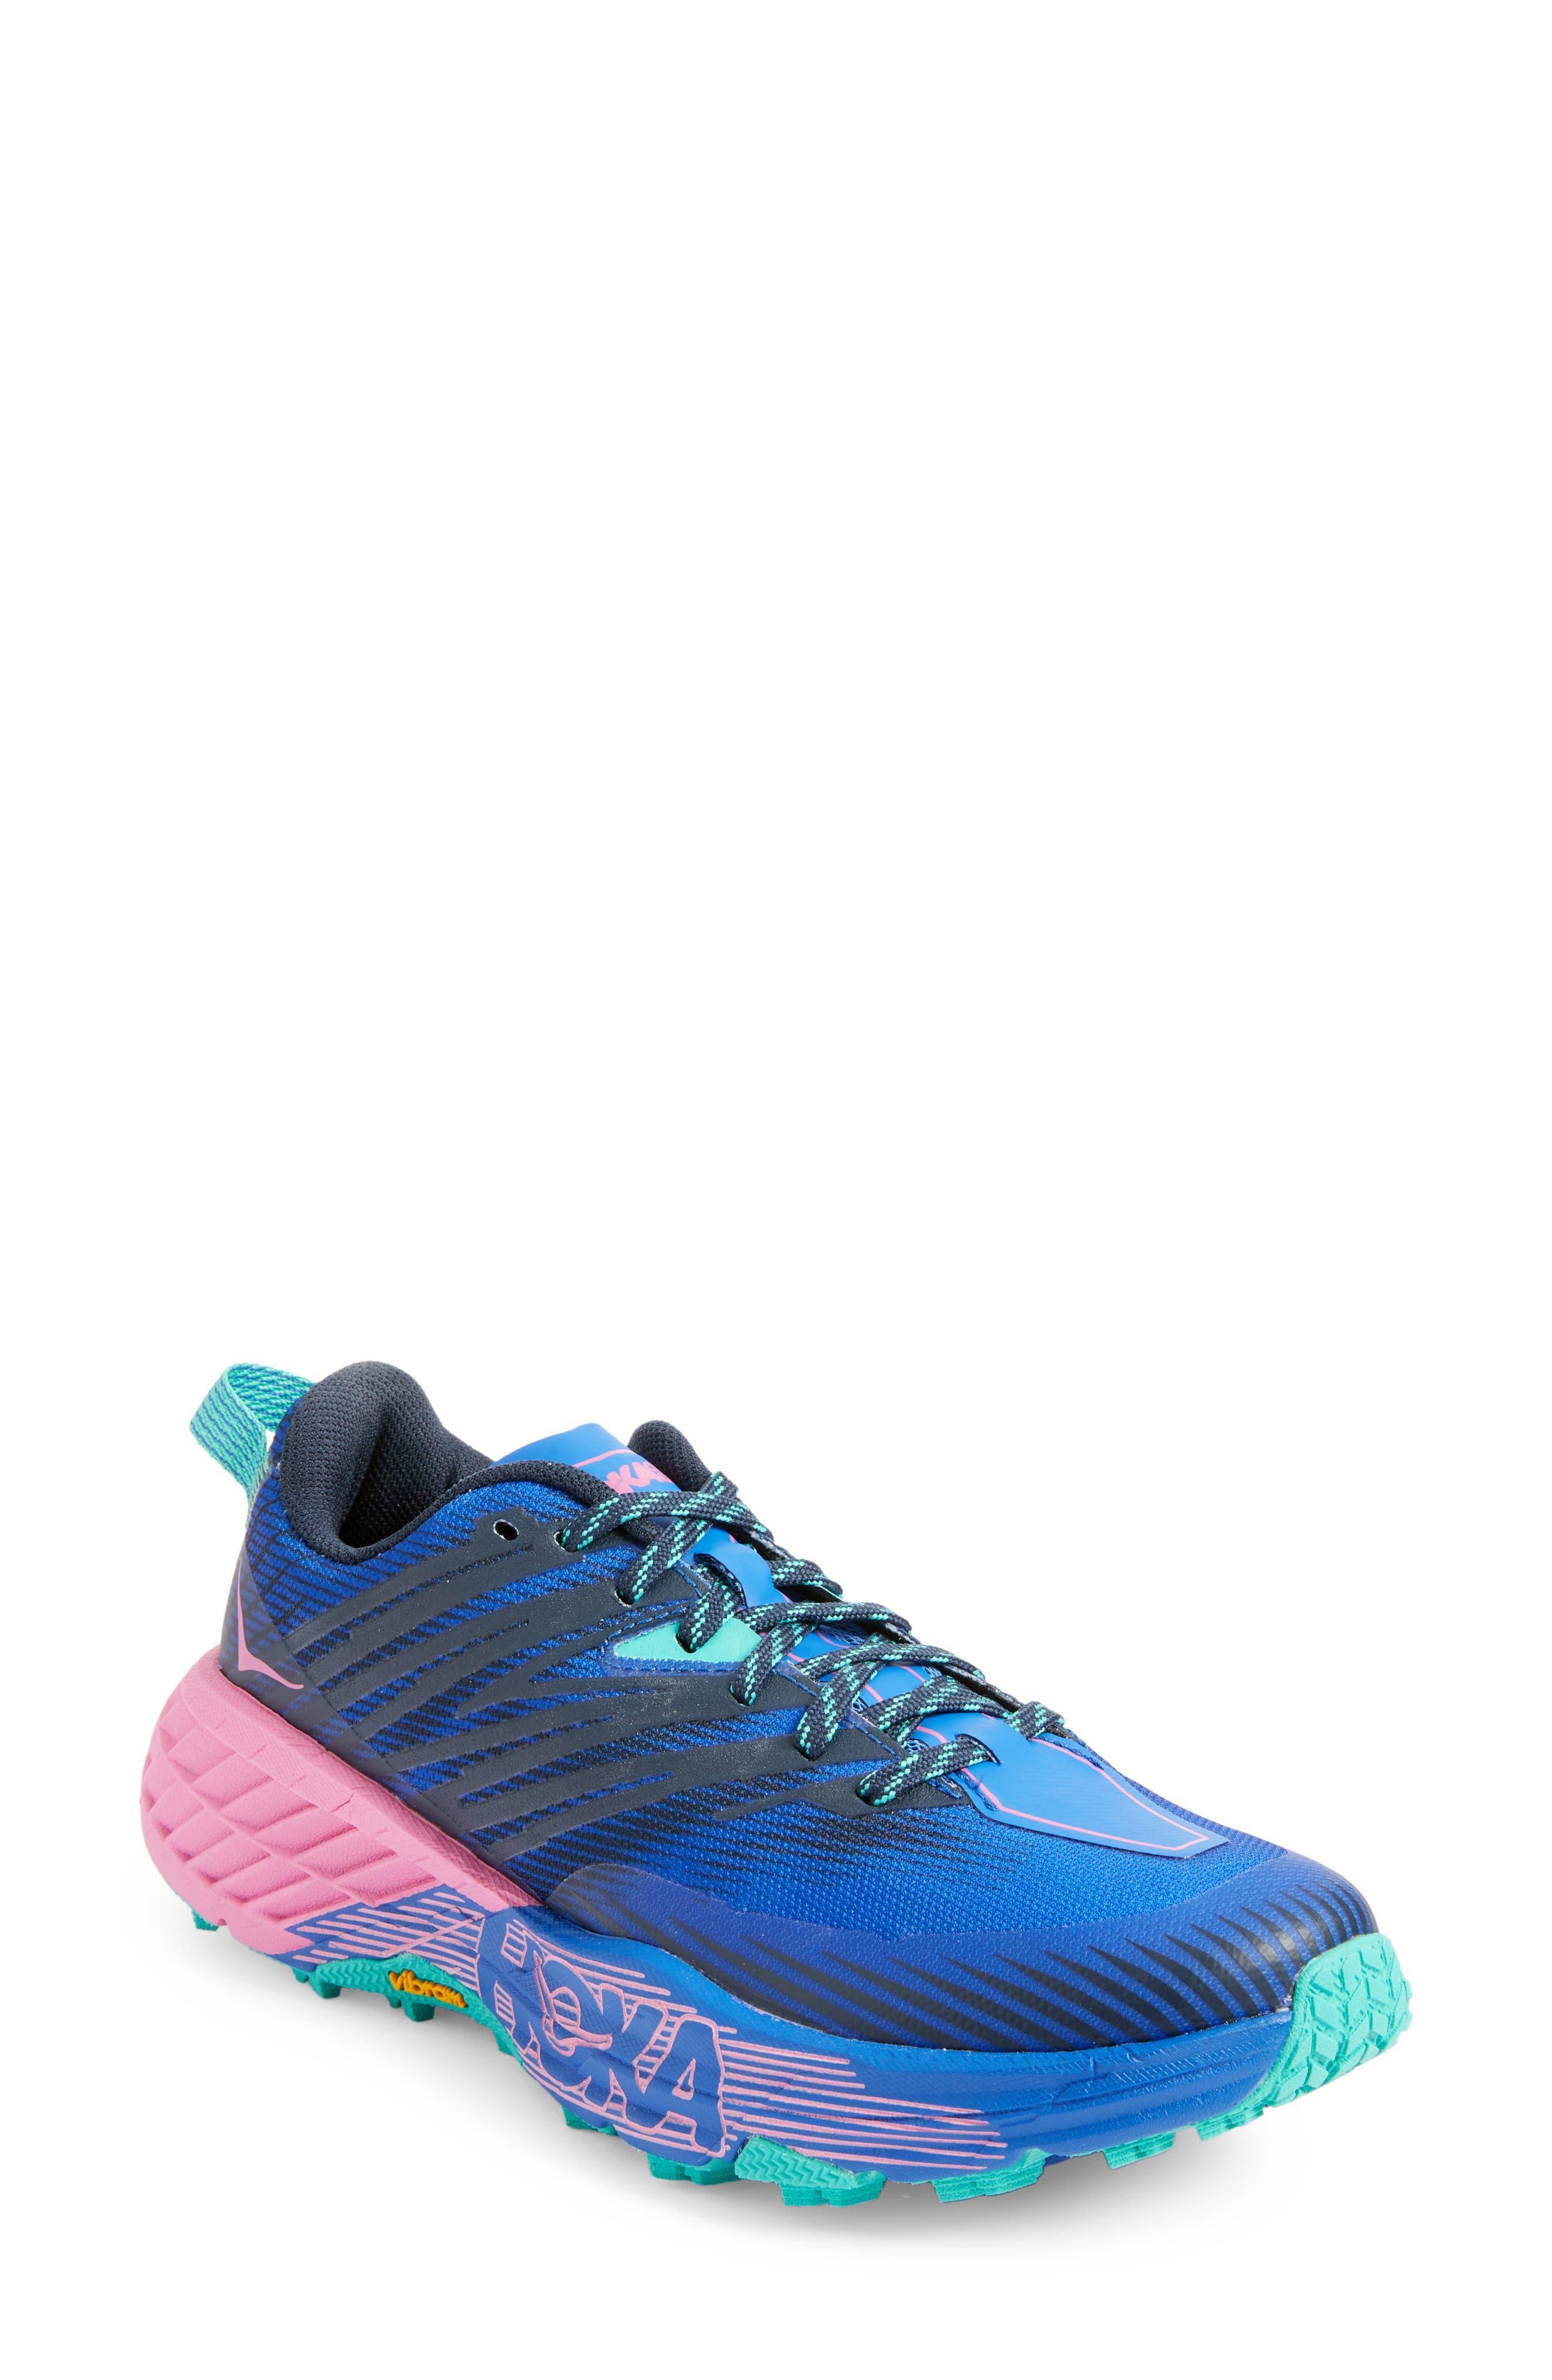 Speedgoat 4 Trail Running Shoe